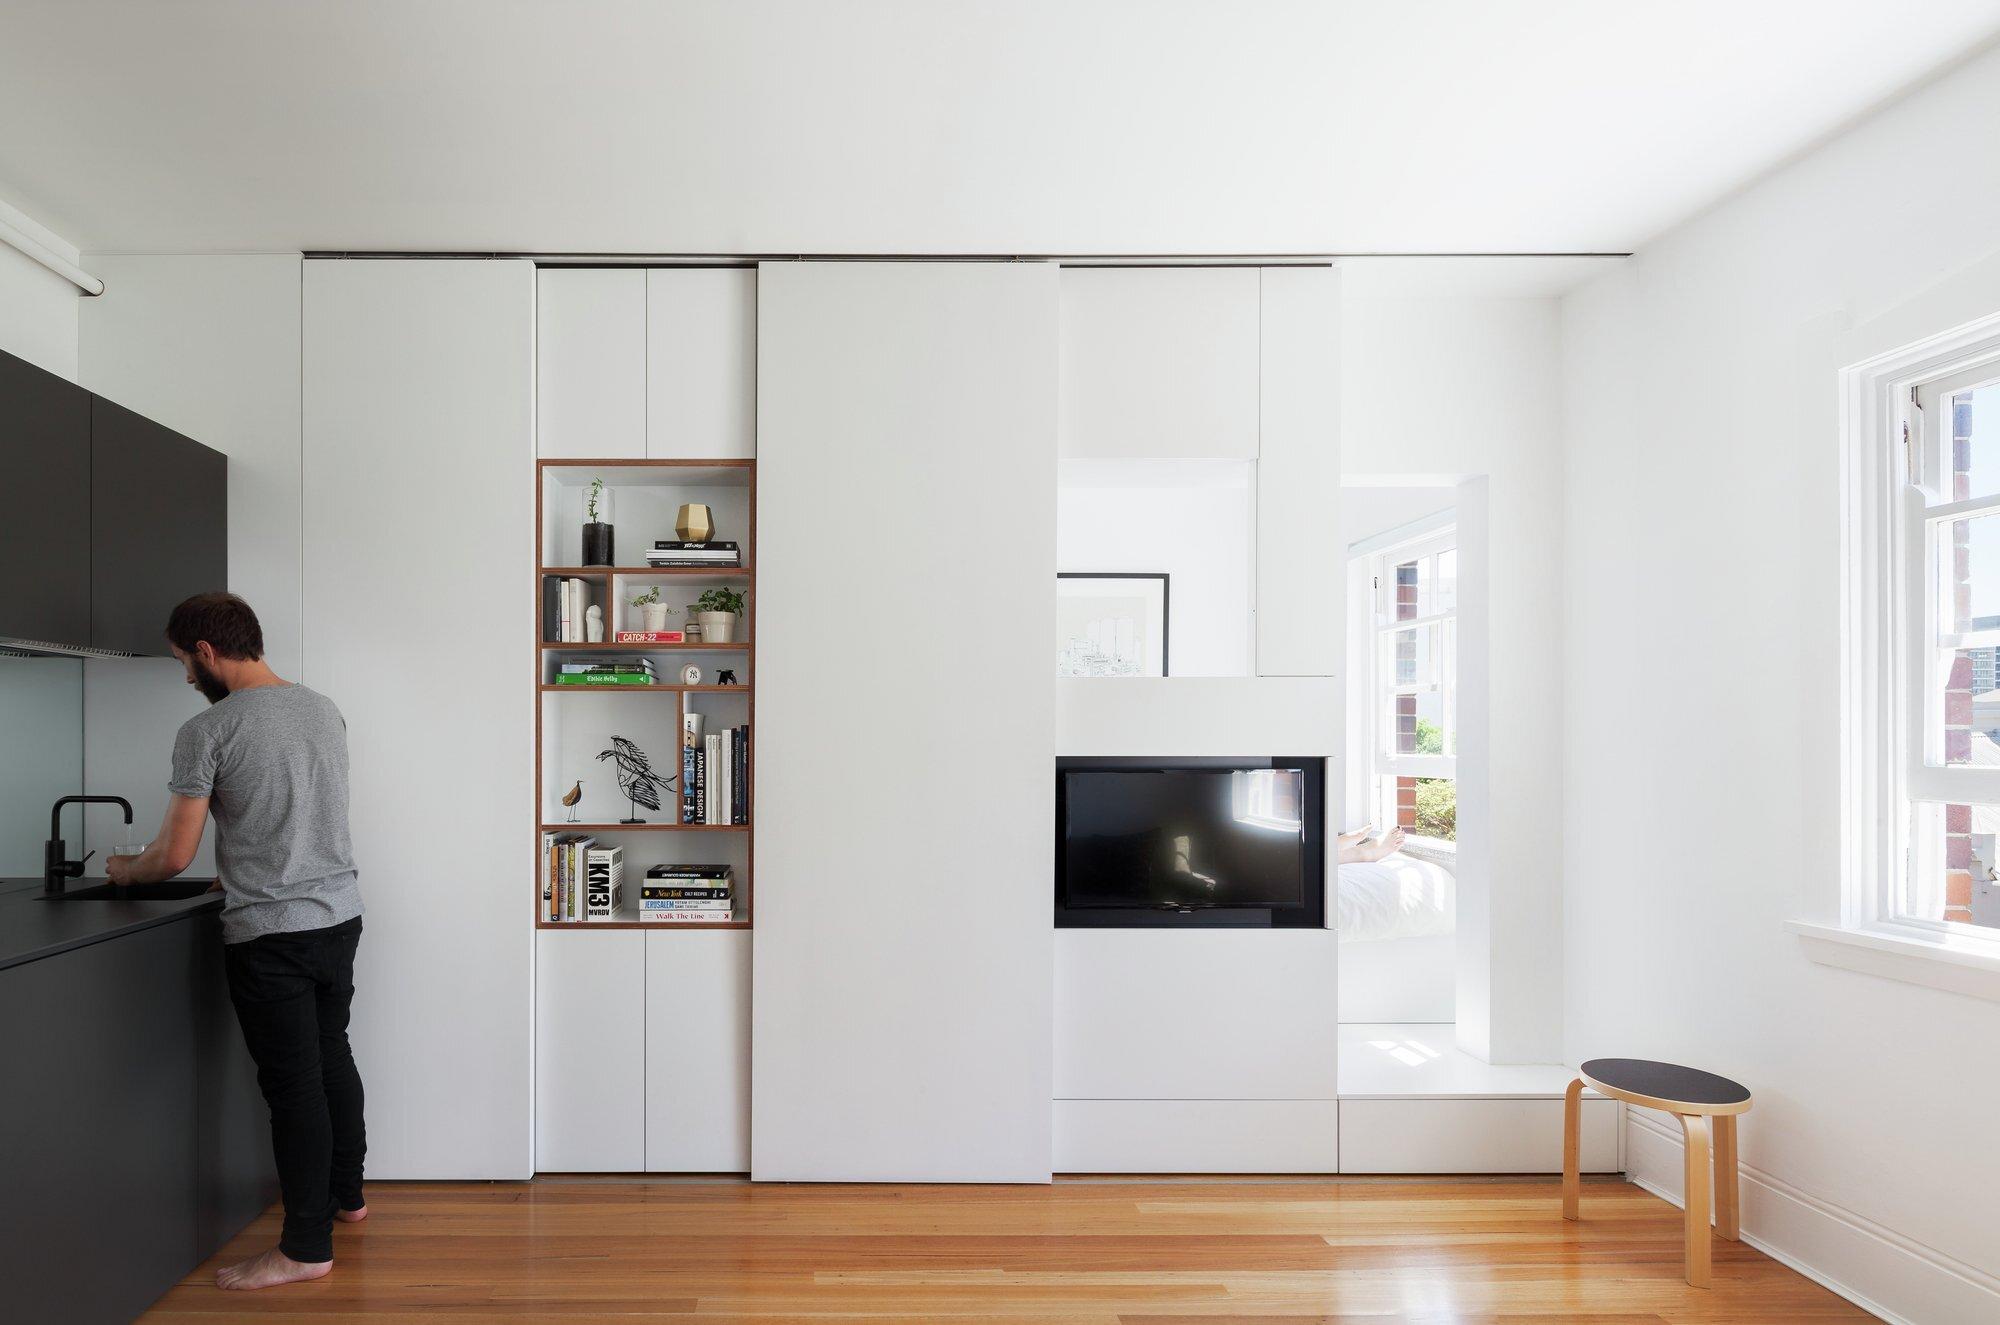 Darlinghurst Apartment - Tiny Apartment - Brad Swartz Architect - Australia - Living Area 1 - Humble Homes